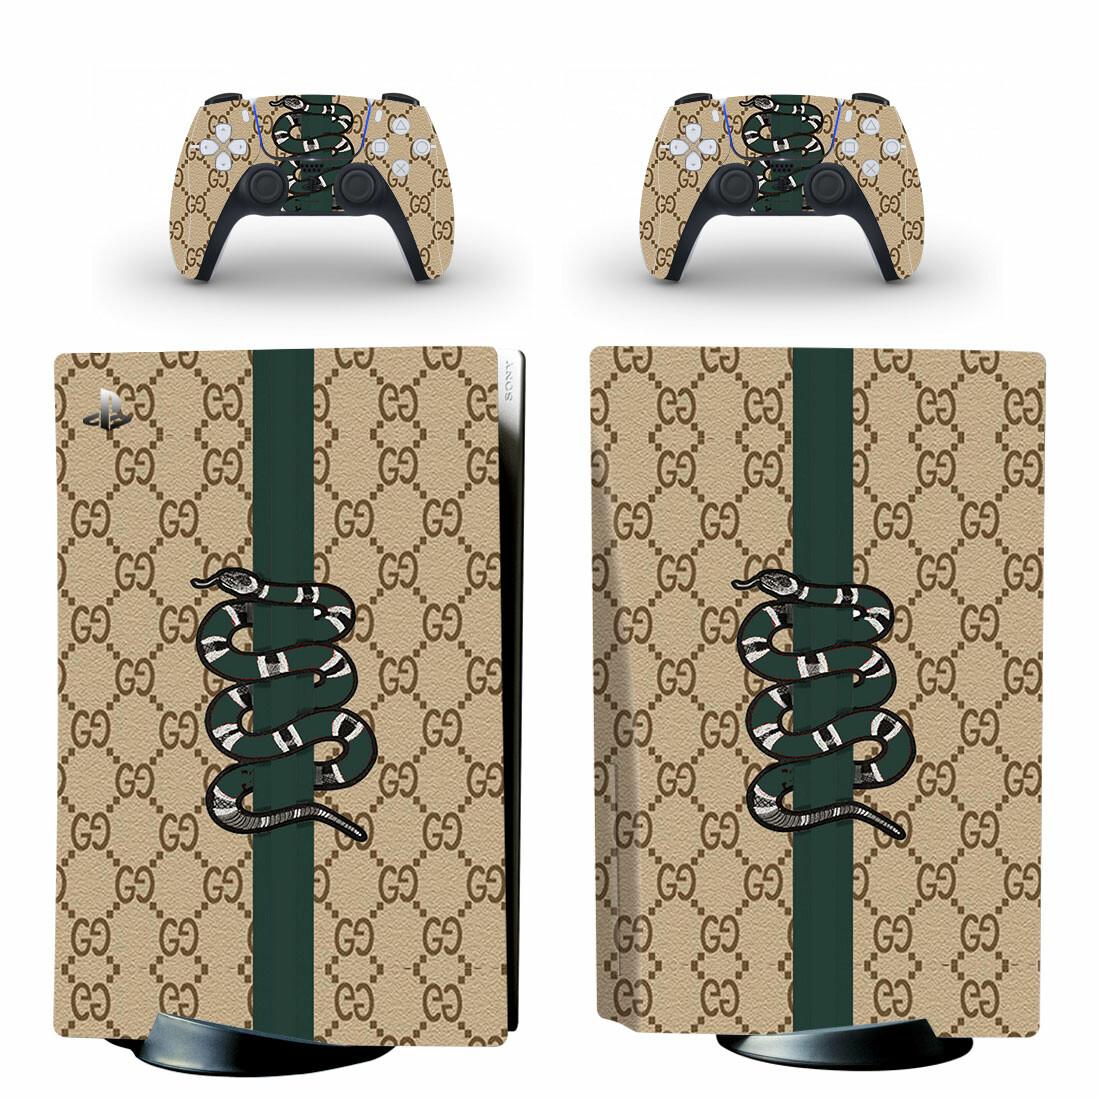 Gucci Drum Kit Wallpaper PS5 Skin Sticker Decal